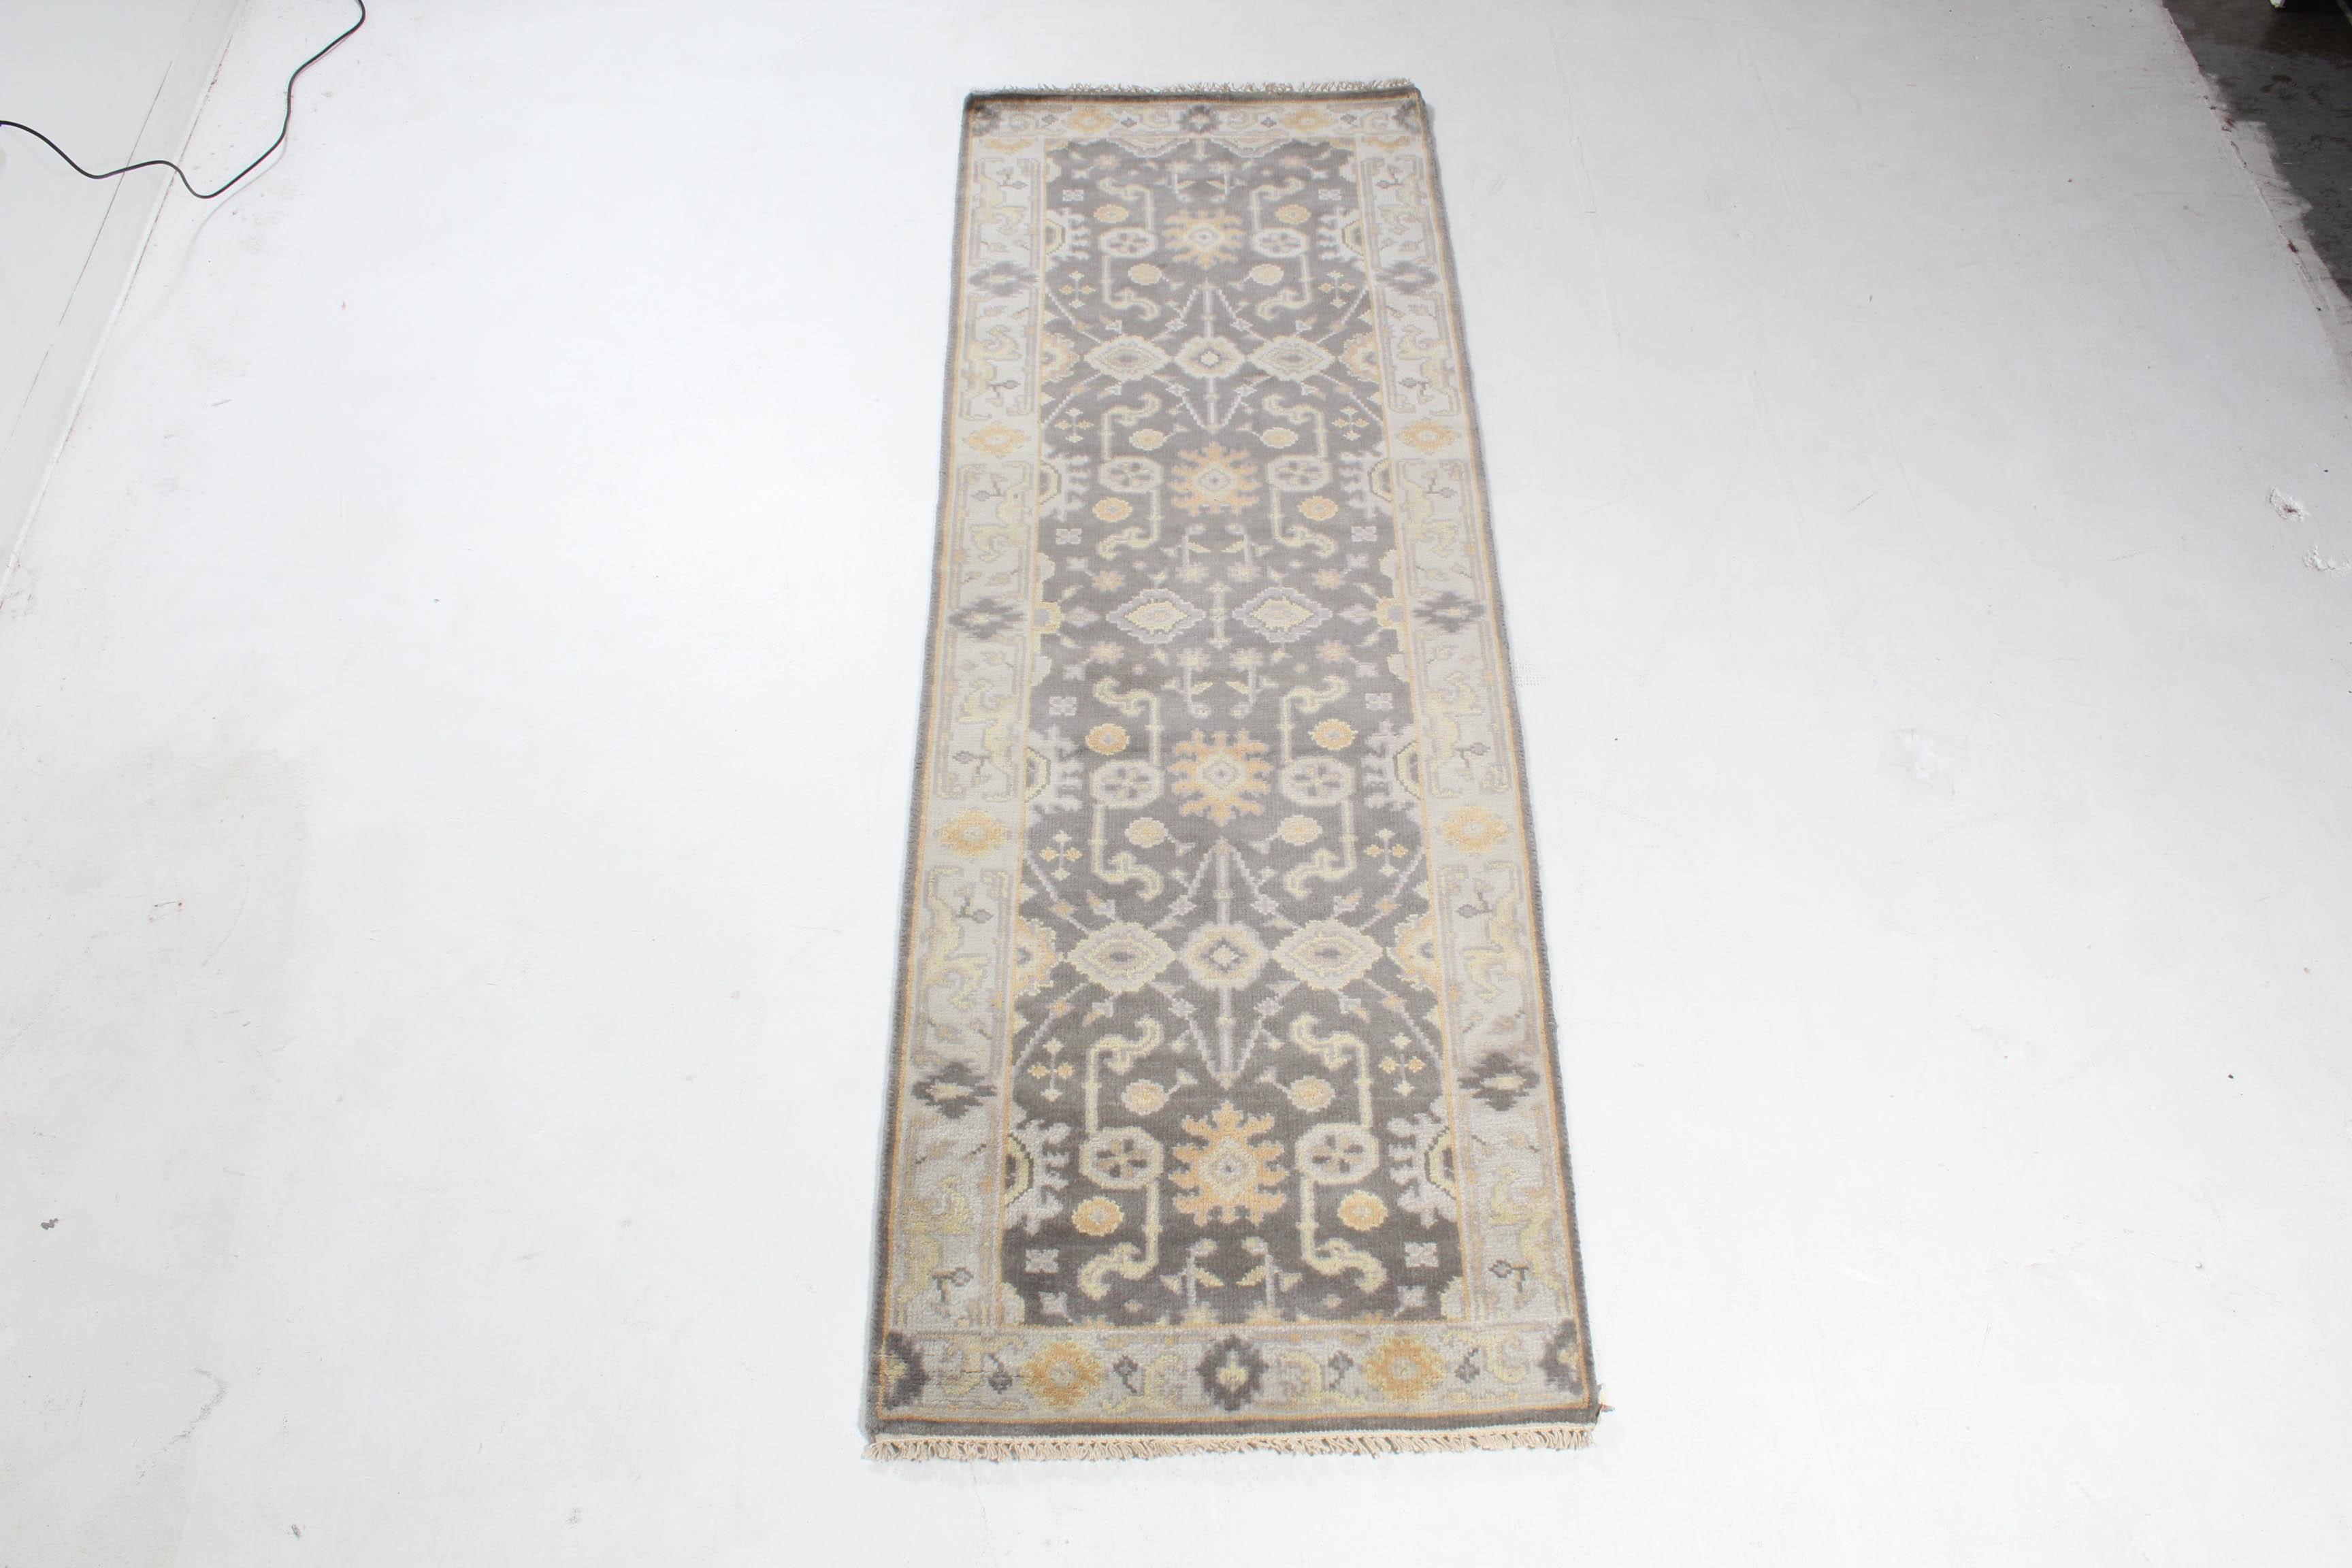 2.8' x 8.1' Hand-Knotted Indo-Turkish Oushak Chobi Carpet Runner